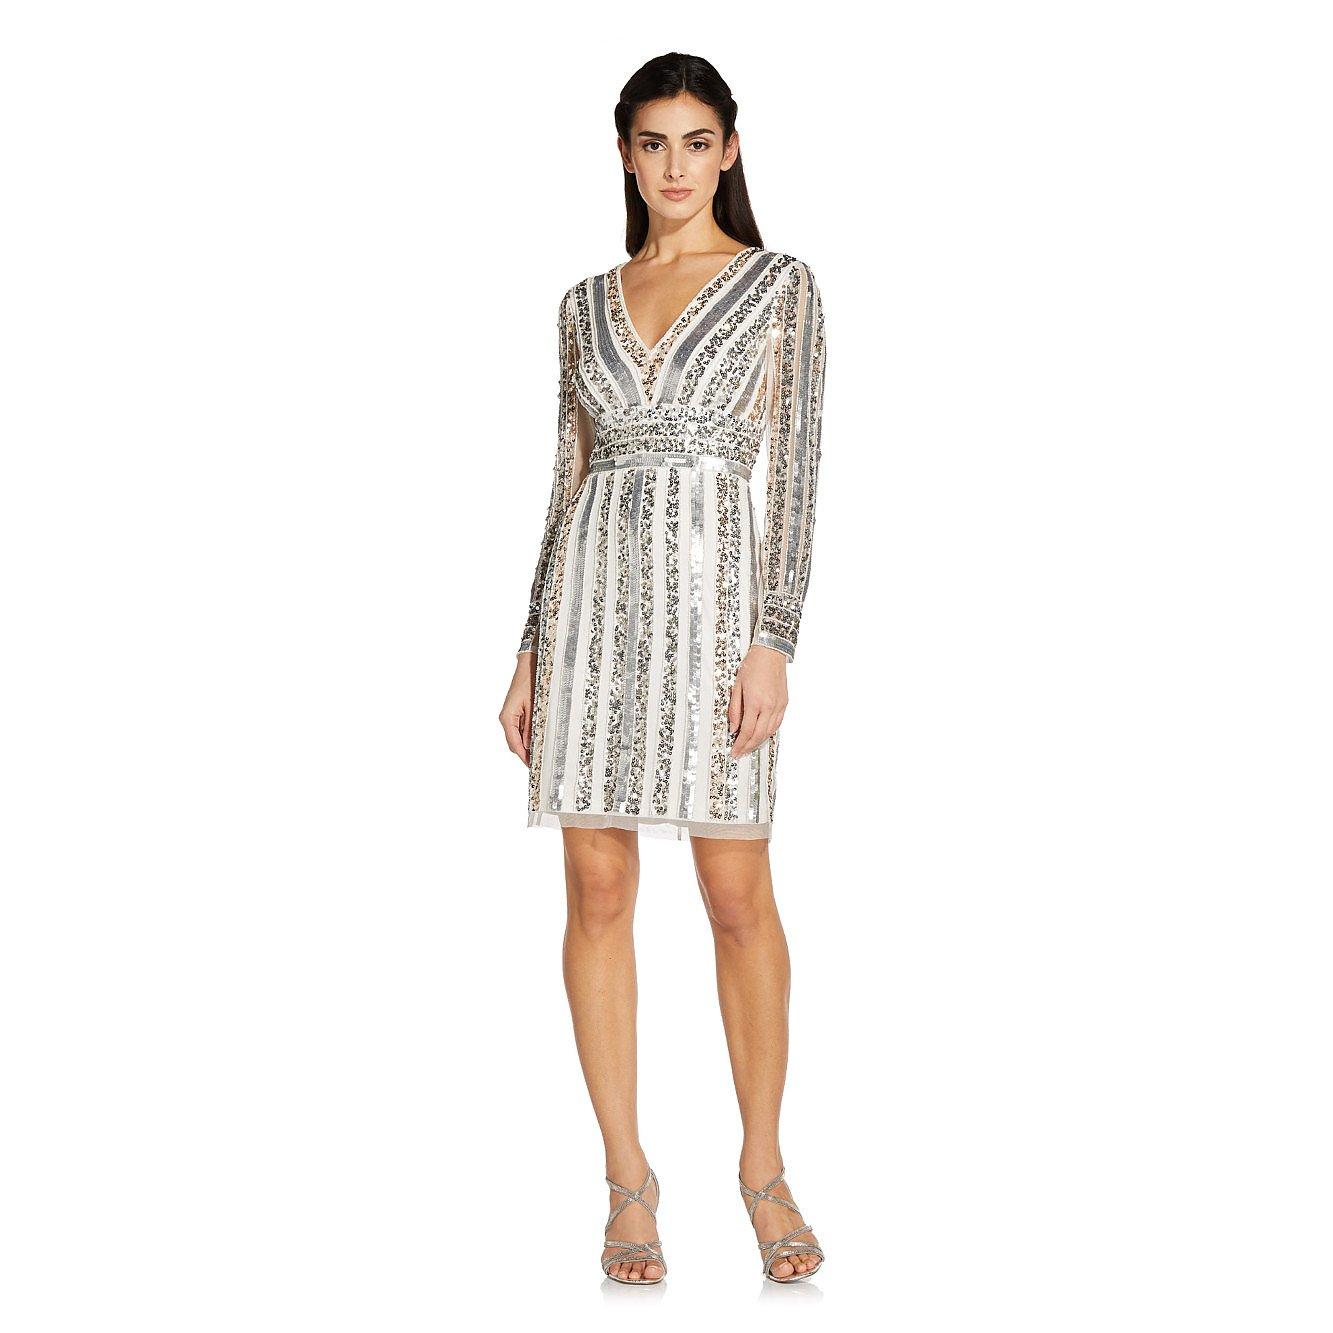 Adrianna Papell Stripe Bead Sheath Dress In Silver/Ivory